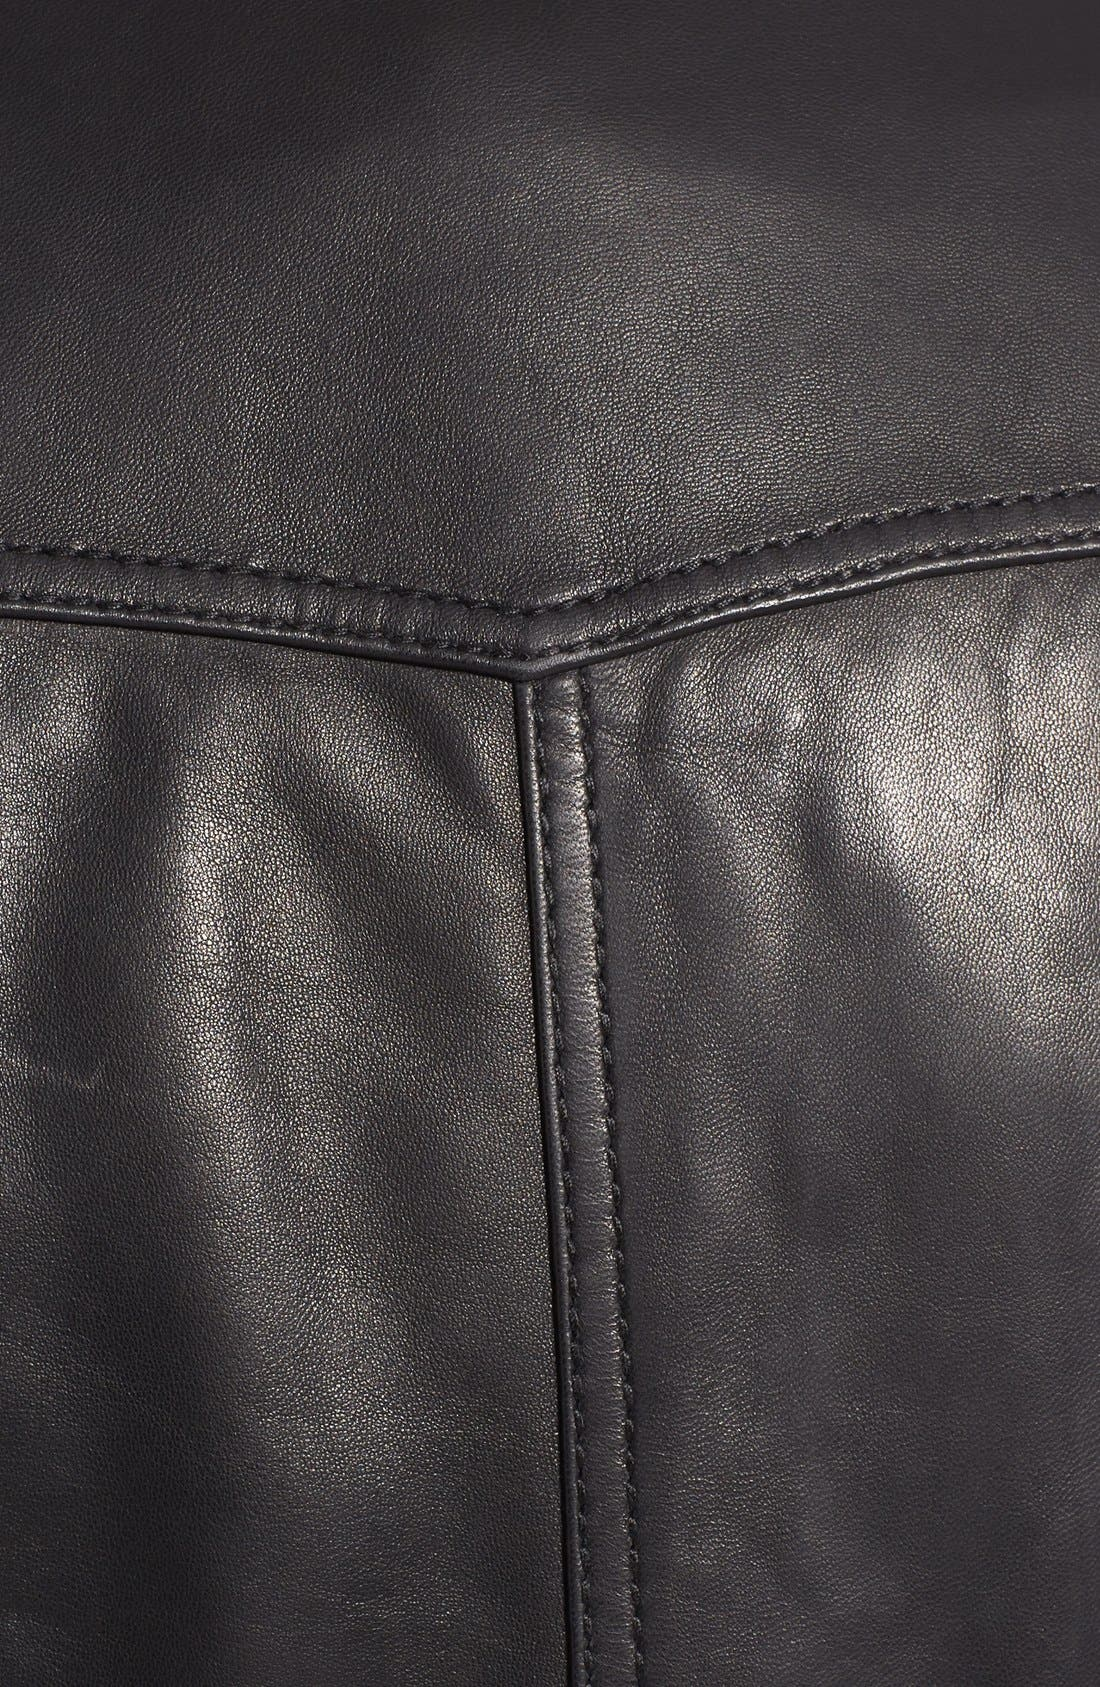 Front Zip Leather Jacket,                             Alternate thumbnail 5, color,                             Black